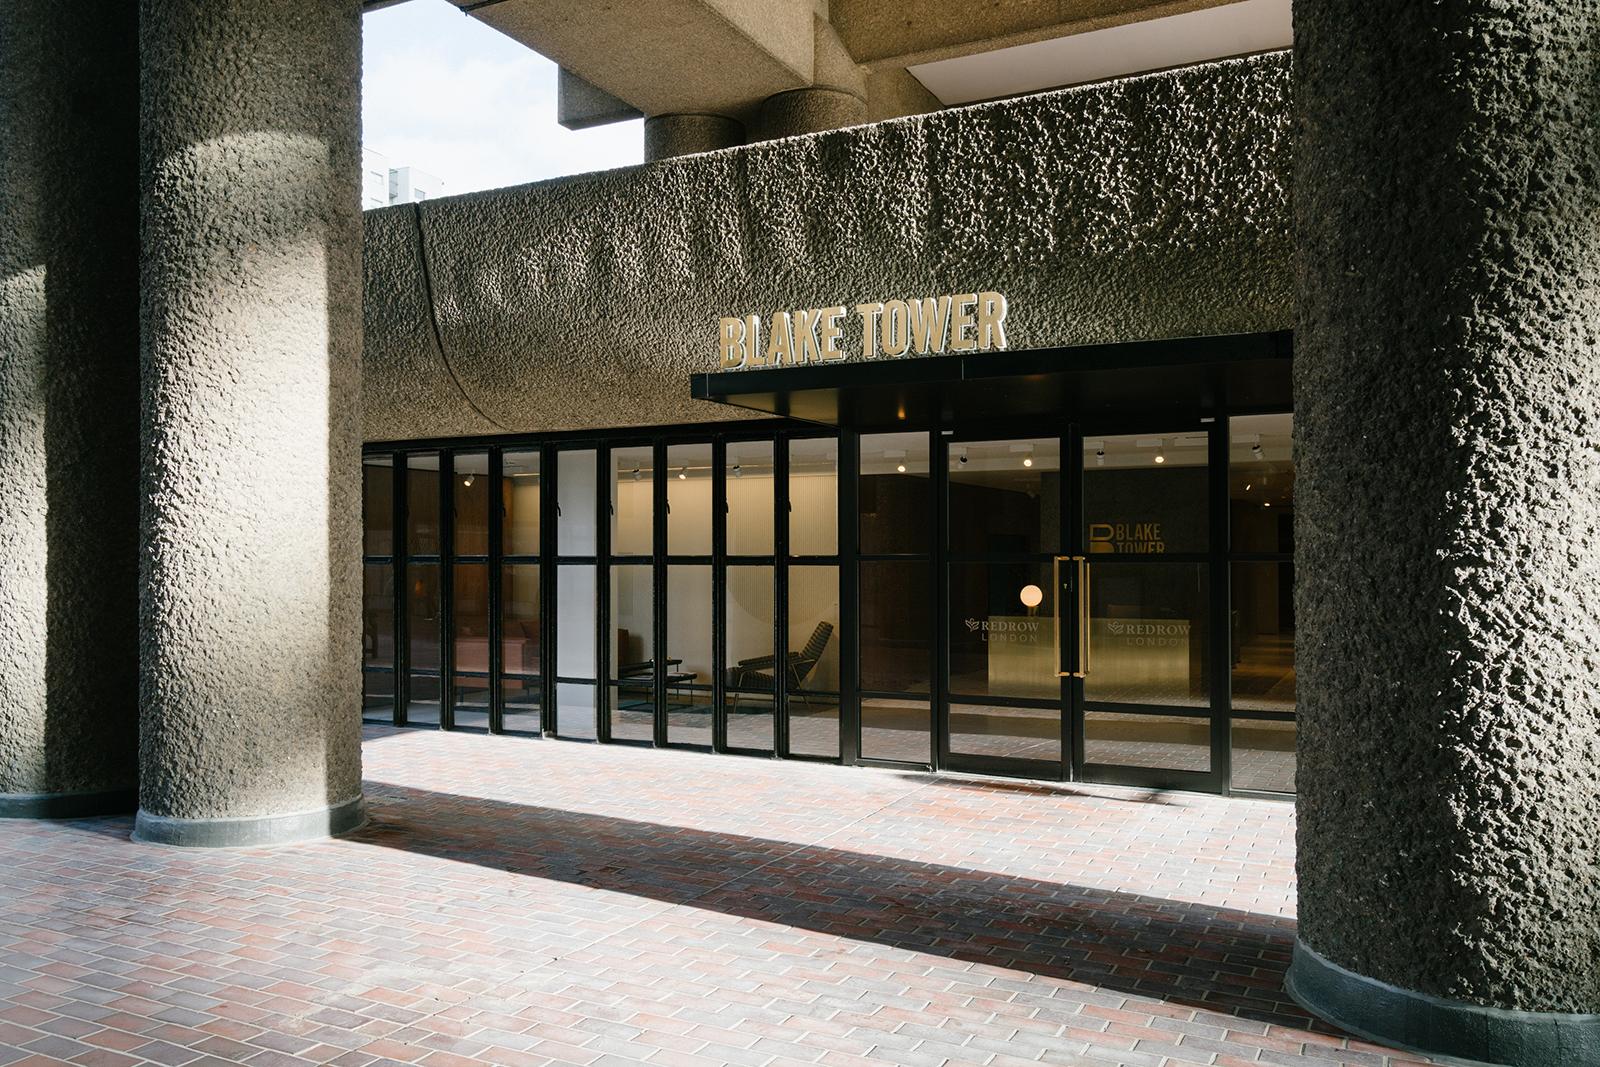 Blake Tower Entrance